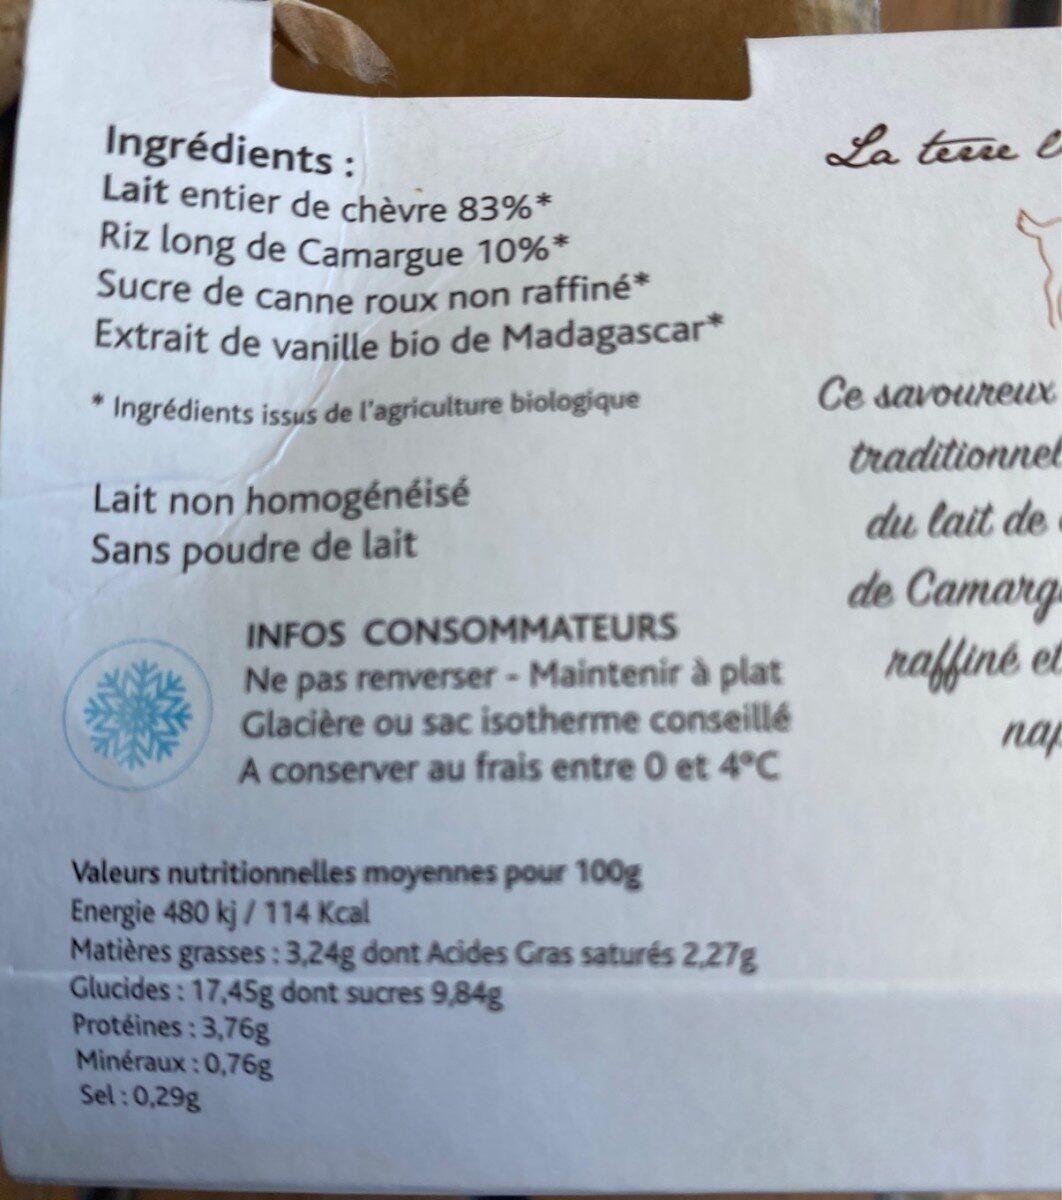 2 X 125G Riz Au Lait Chevre - Voedingswaarden - fr